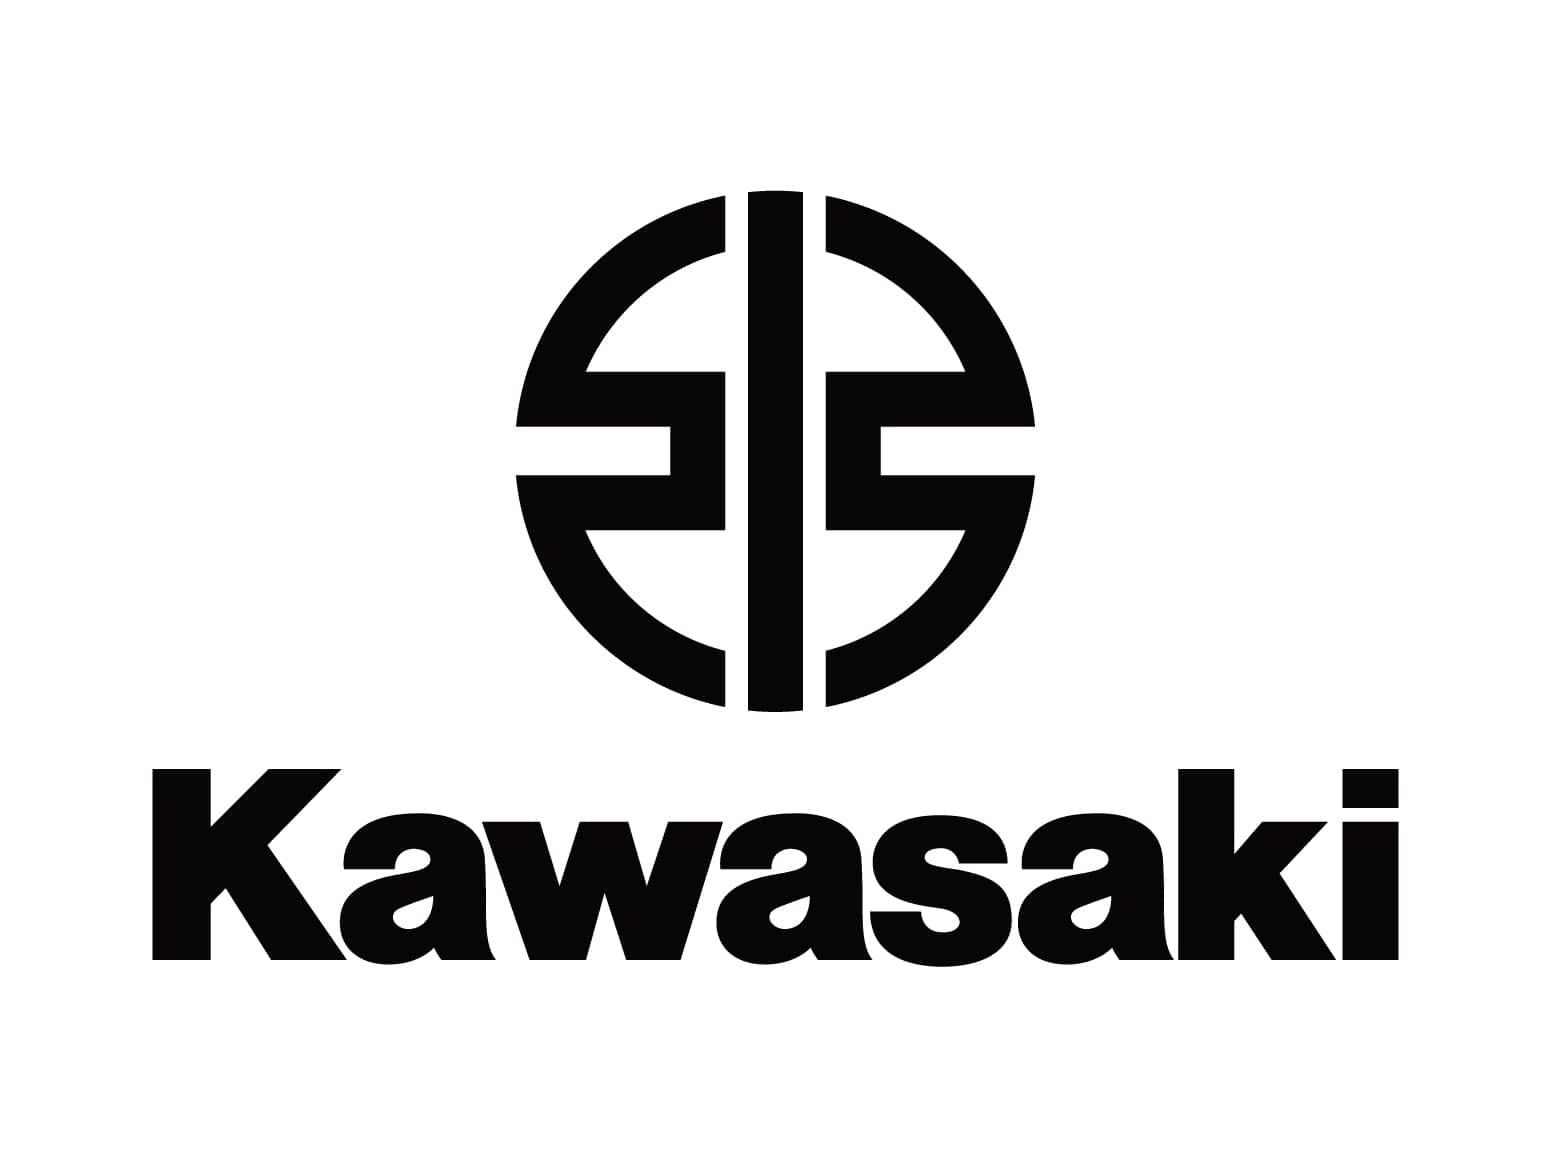 Фото официального логотипа компании KAWASAKI